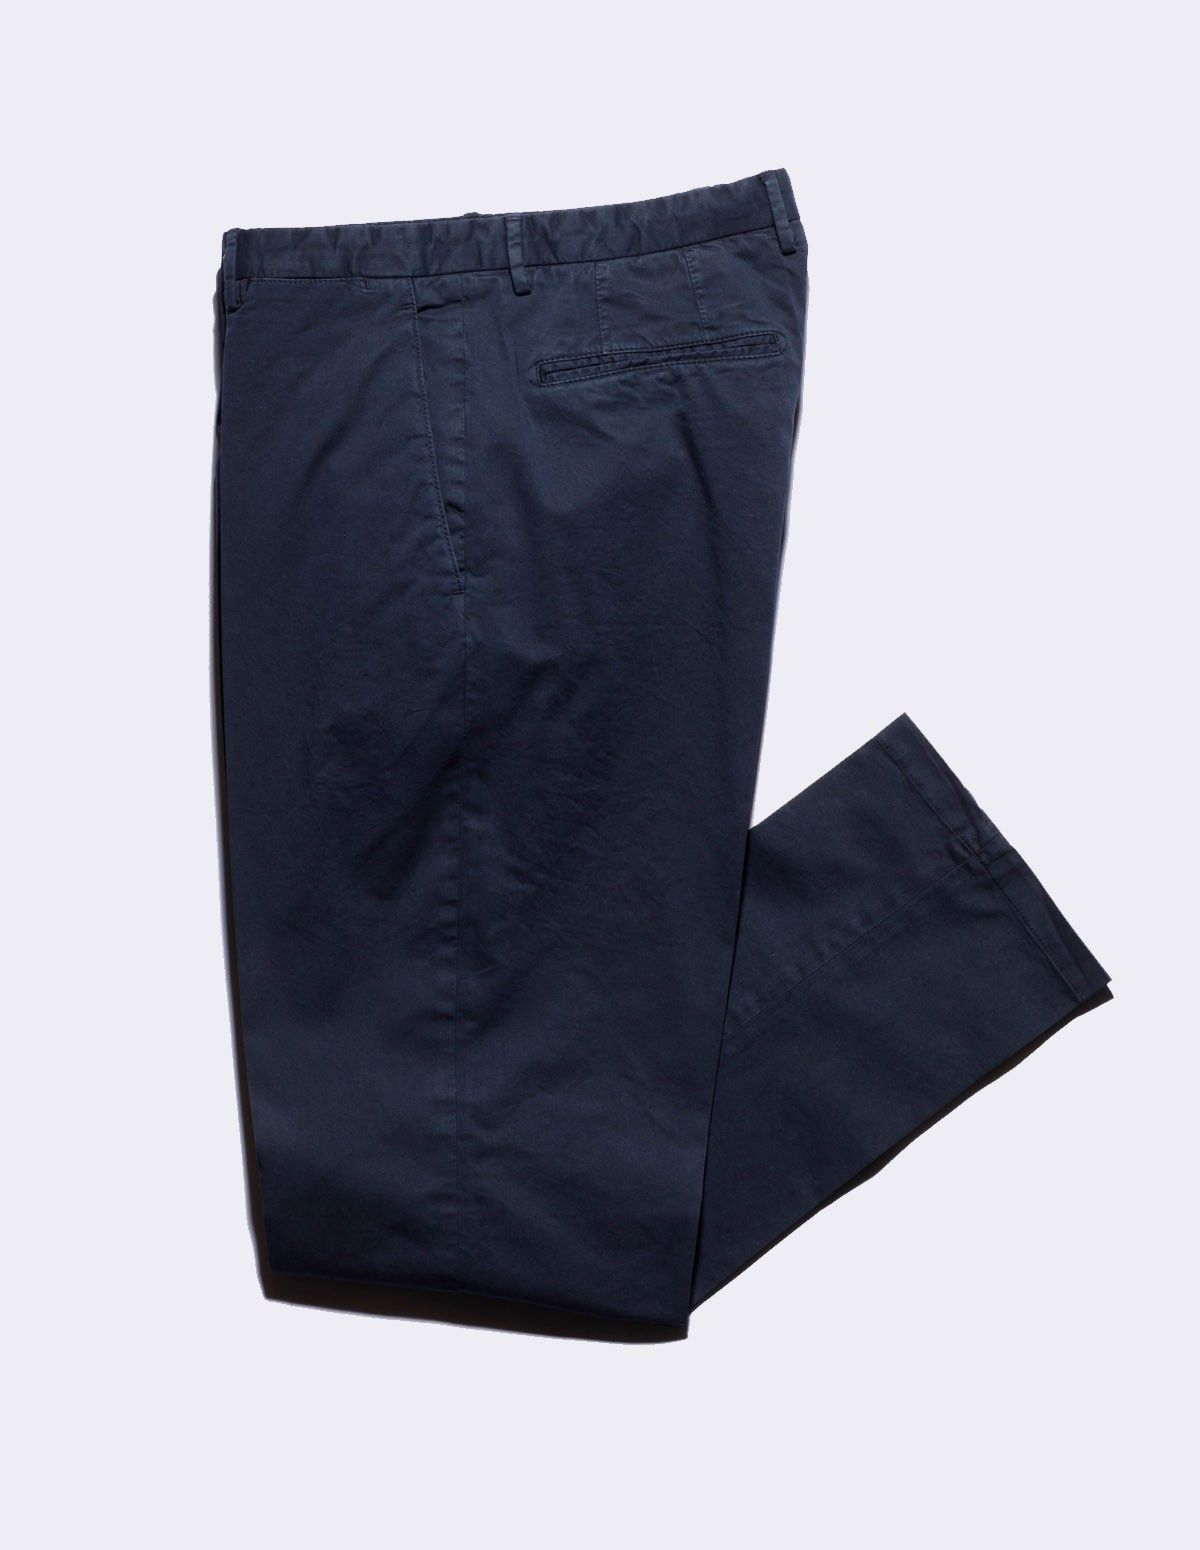 Boglioli Cotton Twill Pants - 0782 NAVY